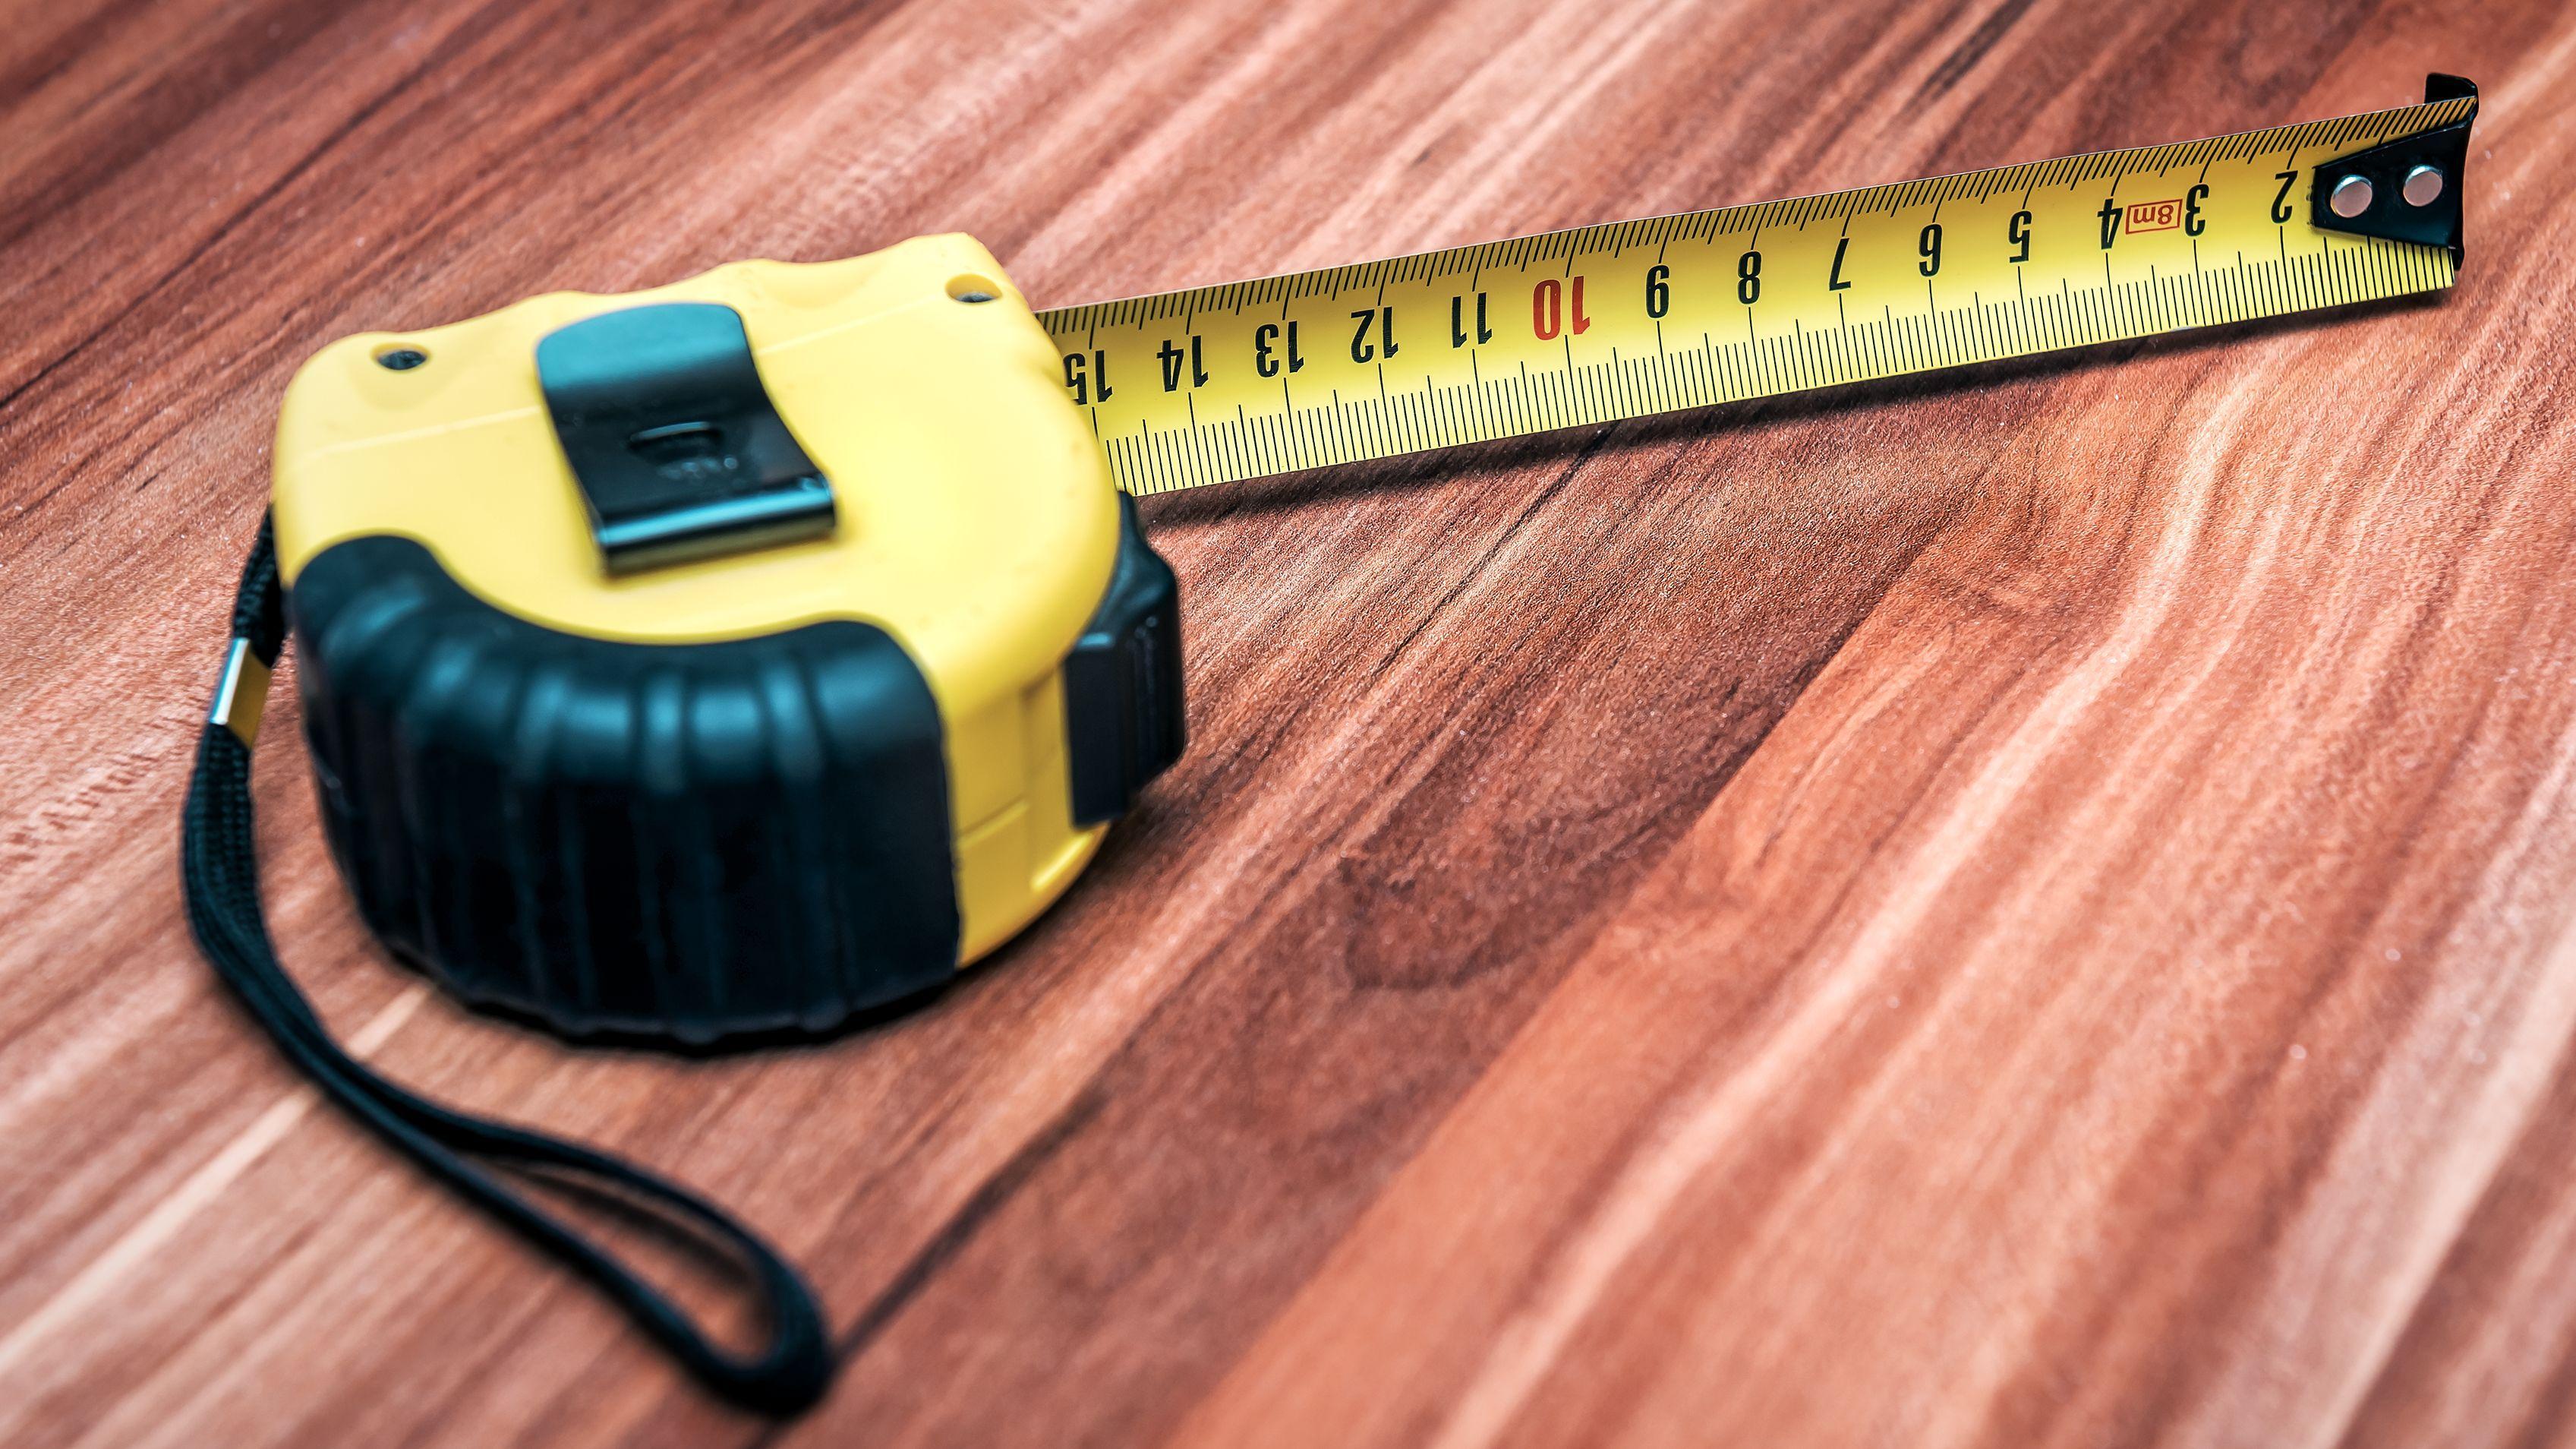 Cómo elegir un flexómetro o cinta métrica